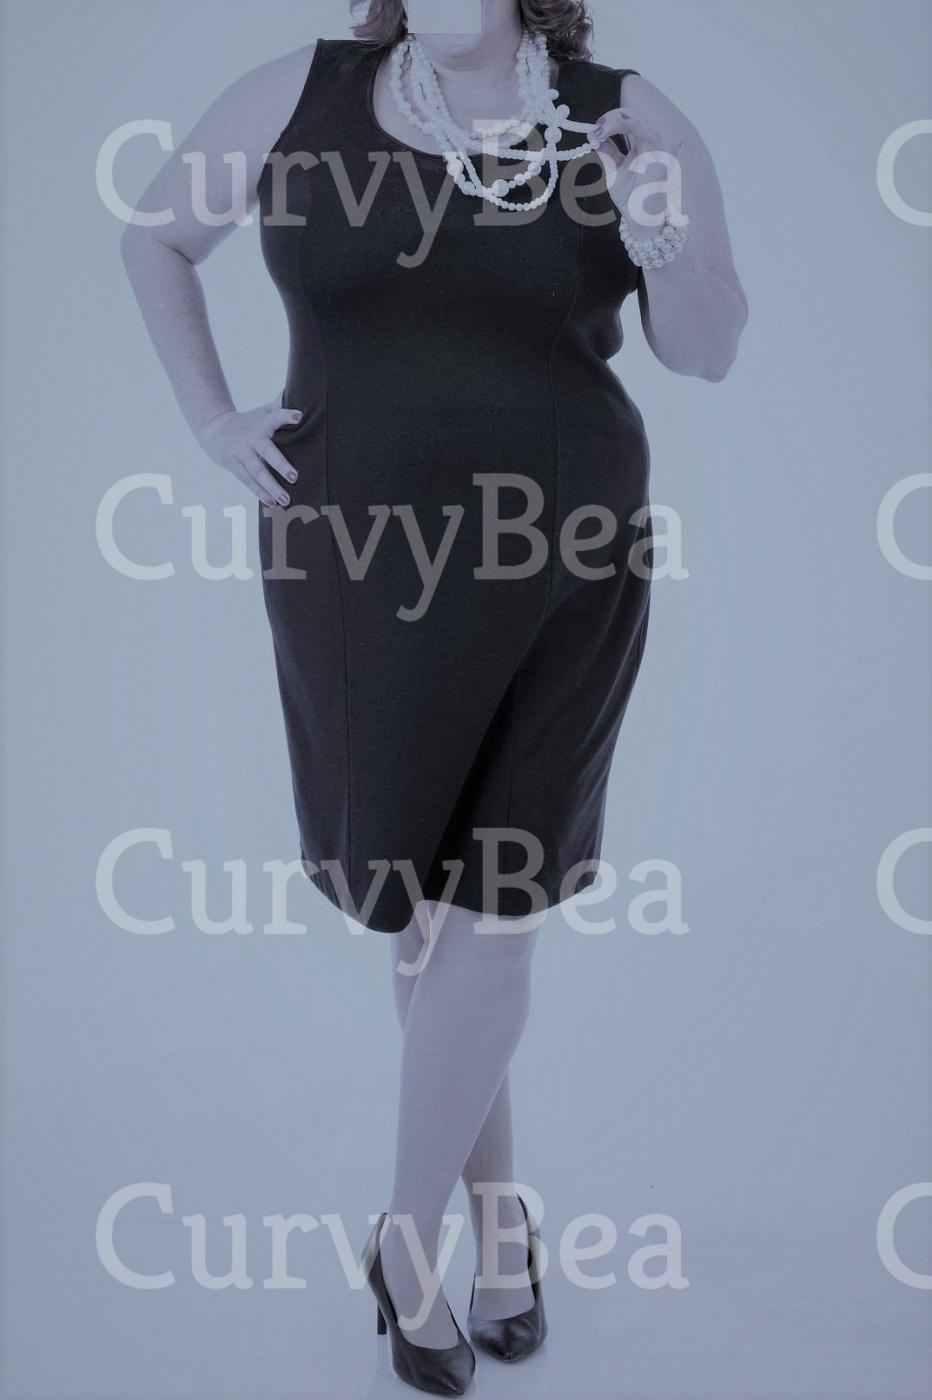 CurvyBea - BBW Companion